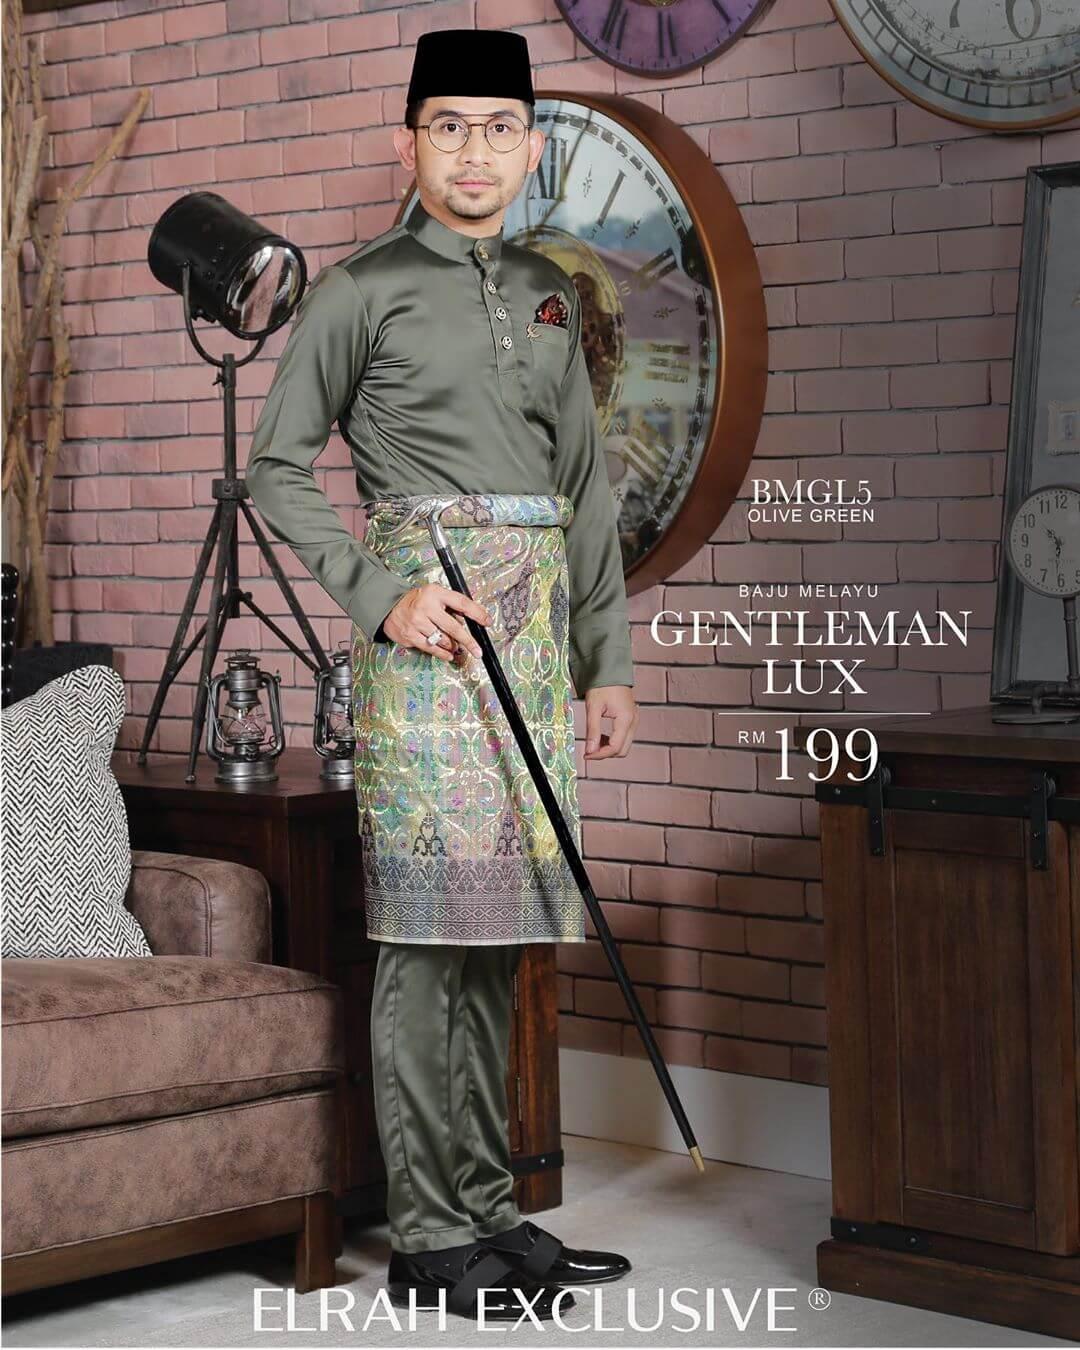 Baju Melayu Gentleman Lux Olive Green